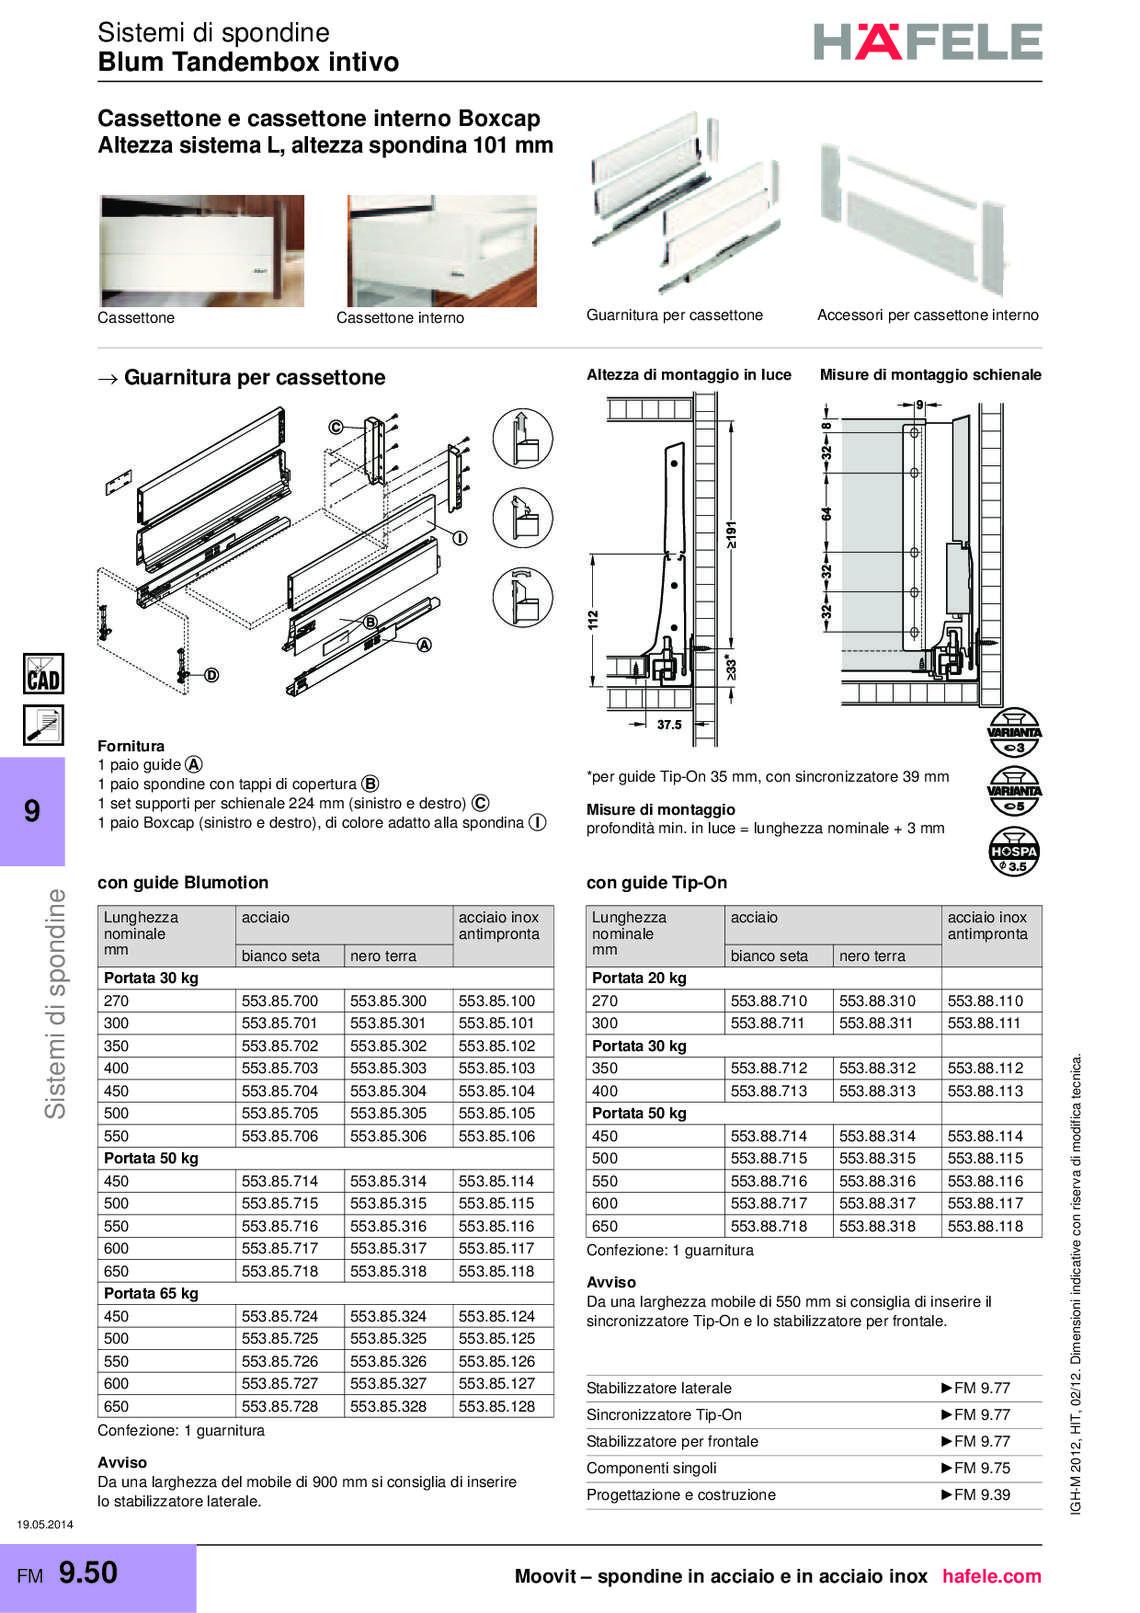 hafele-spondine-e-guide-per-mobili_40_061.jpg